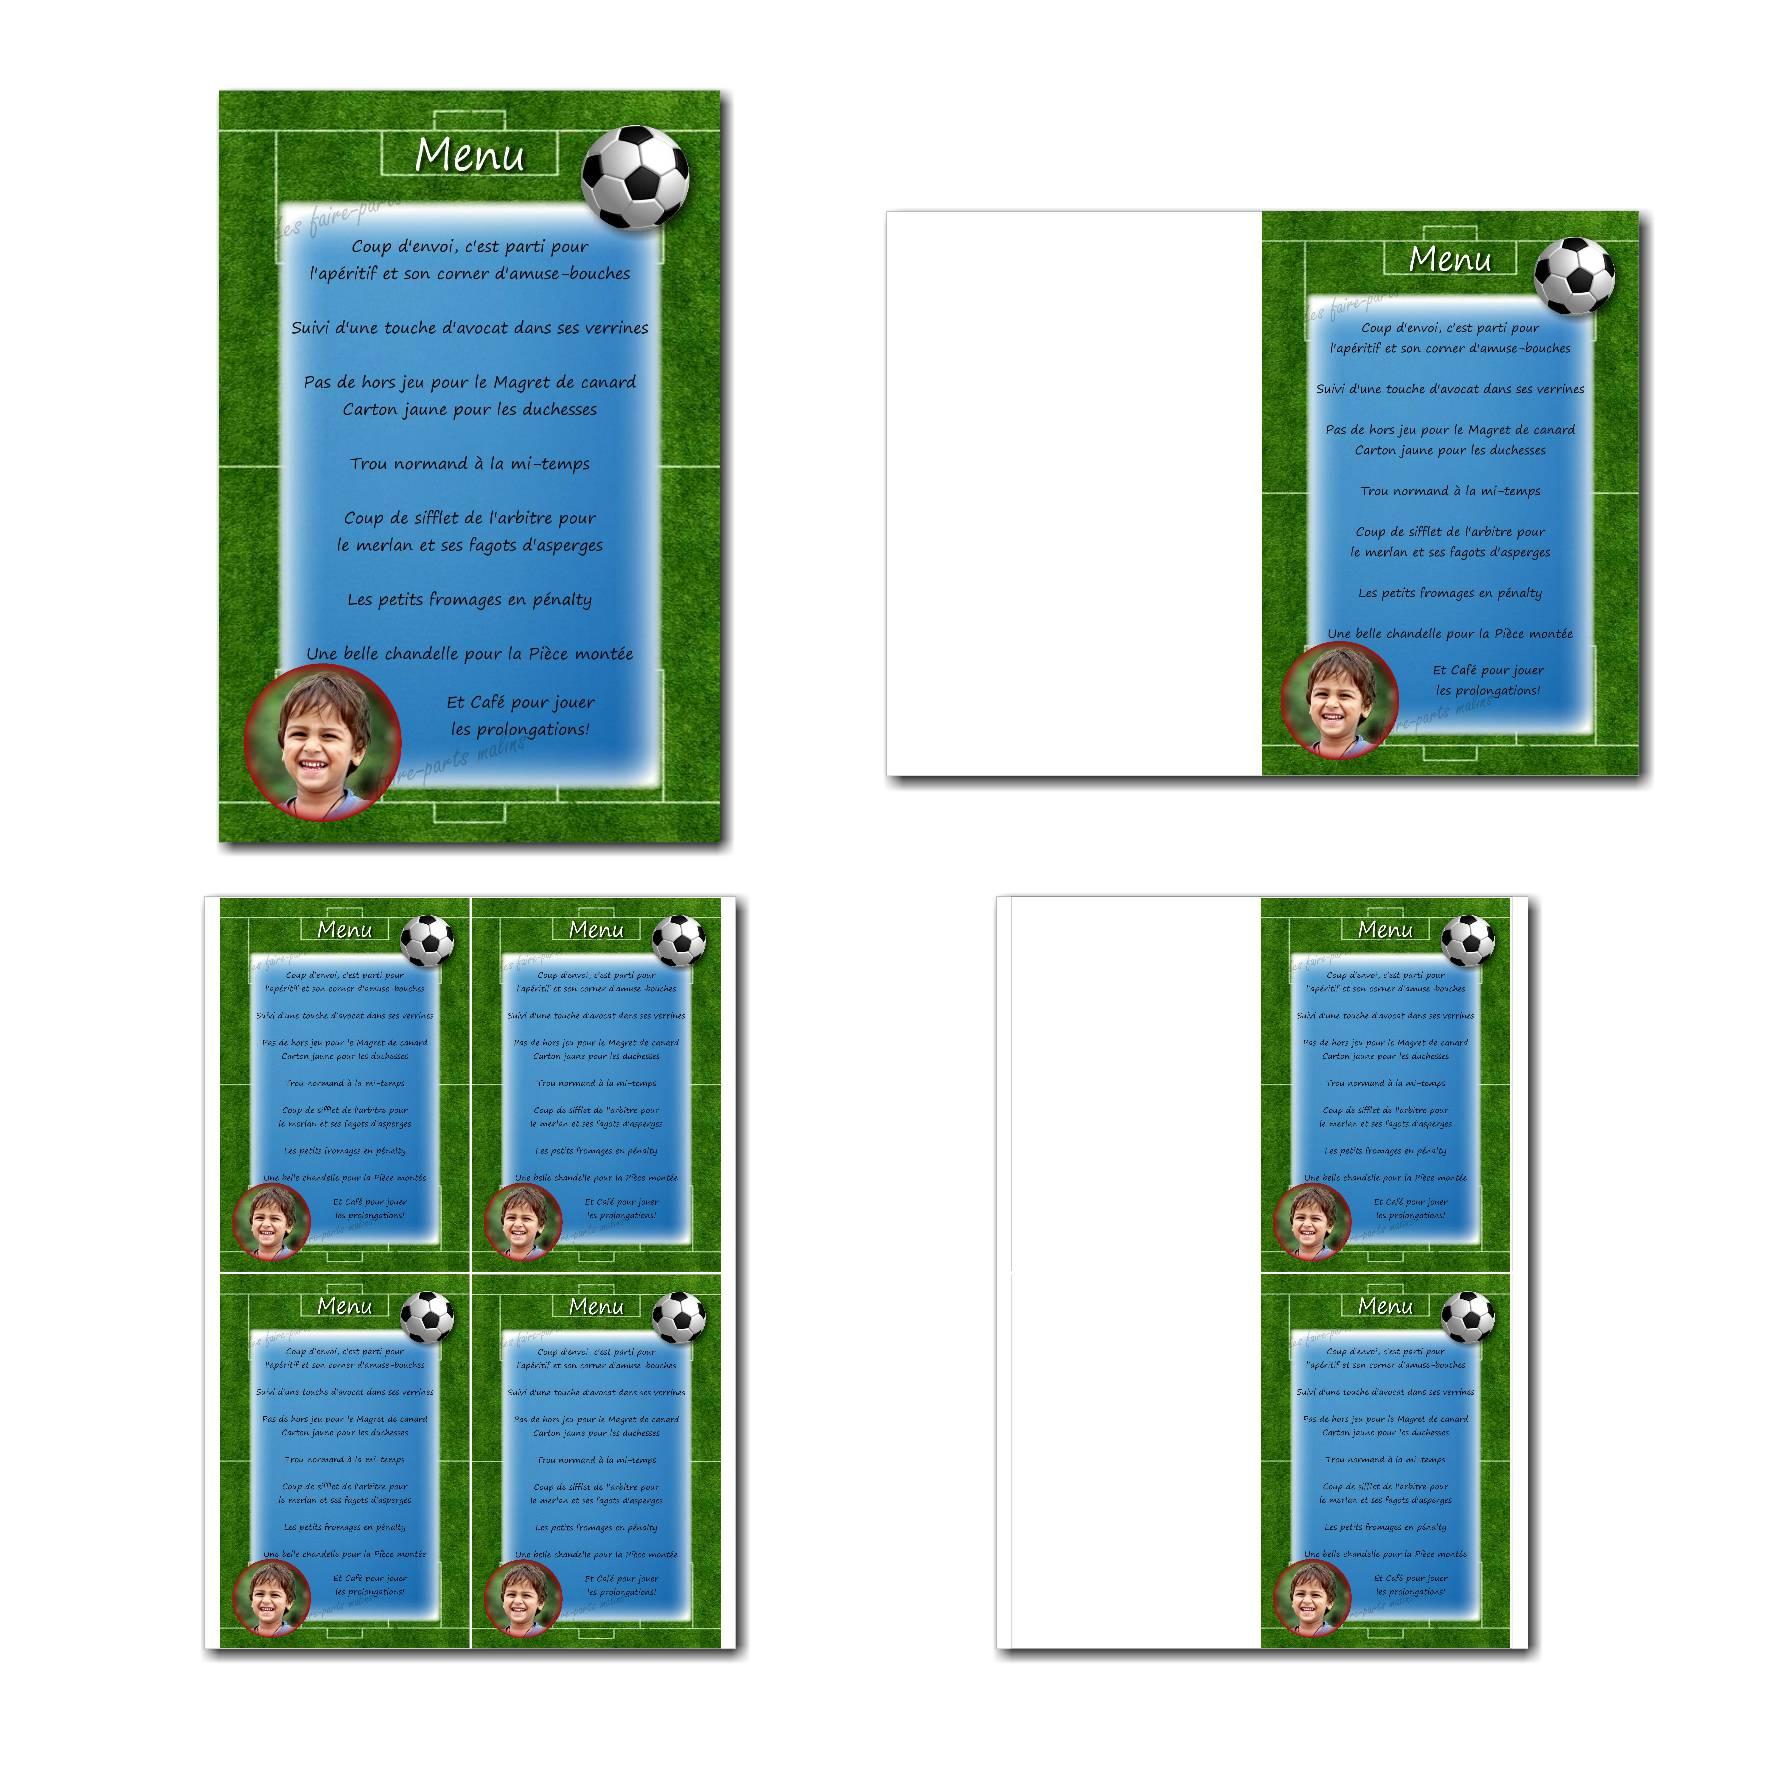 Pai 03 garcon menu 10x15